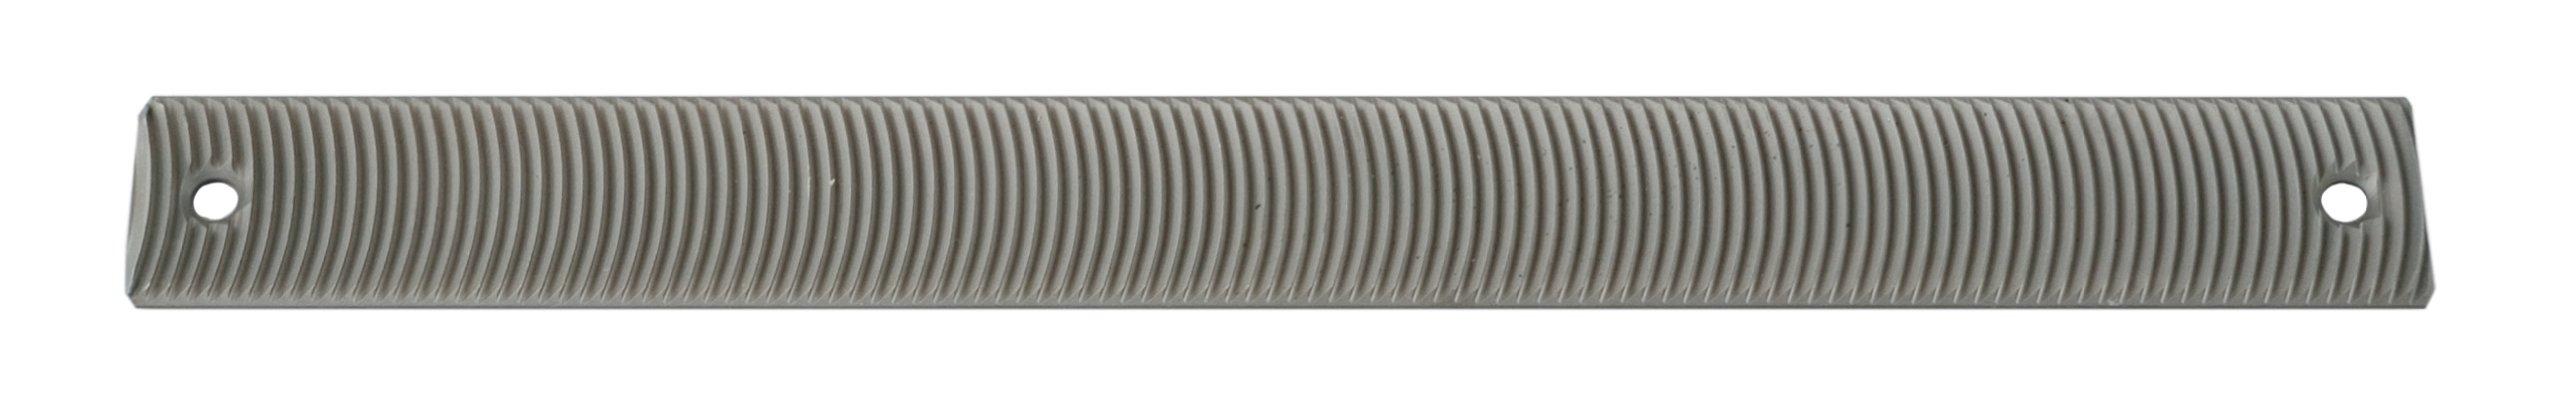 Martin 1158F Standard Body File, 14'' Overall Length